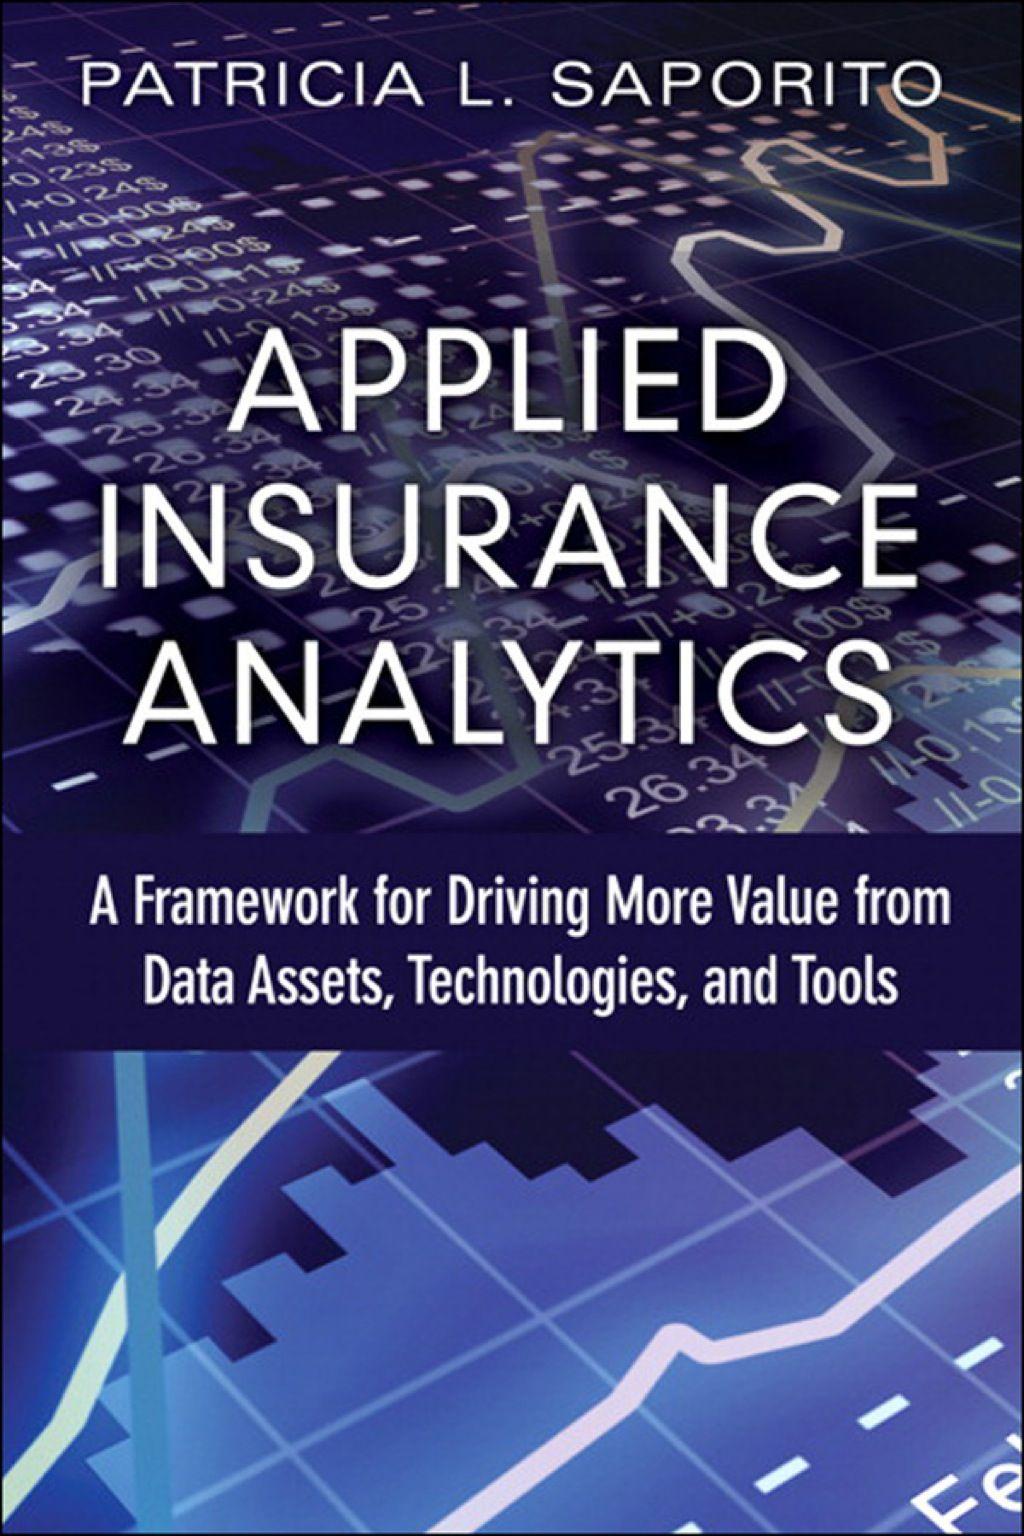 Applied Insurance Analytics Ebook How To Apply Analytics